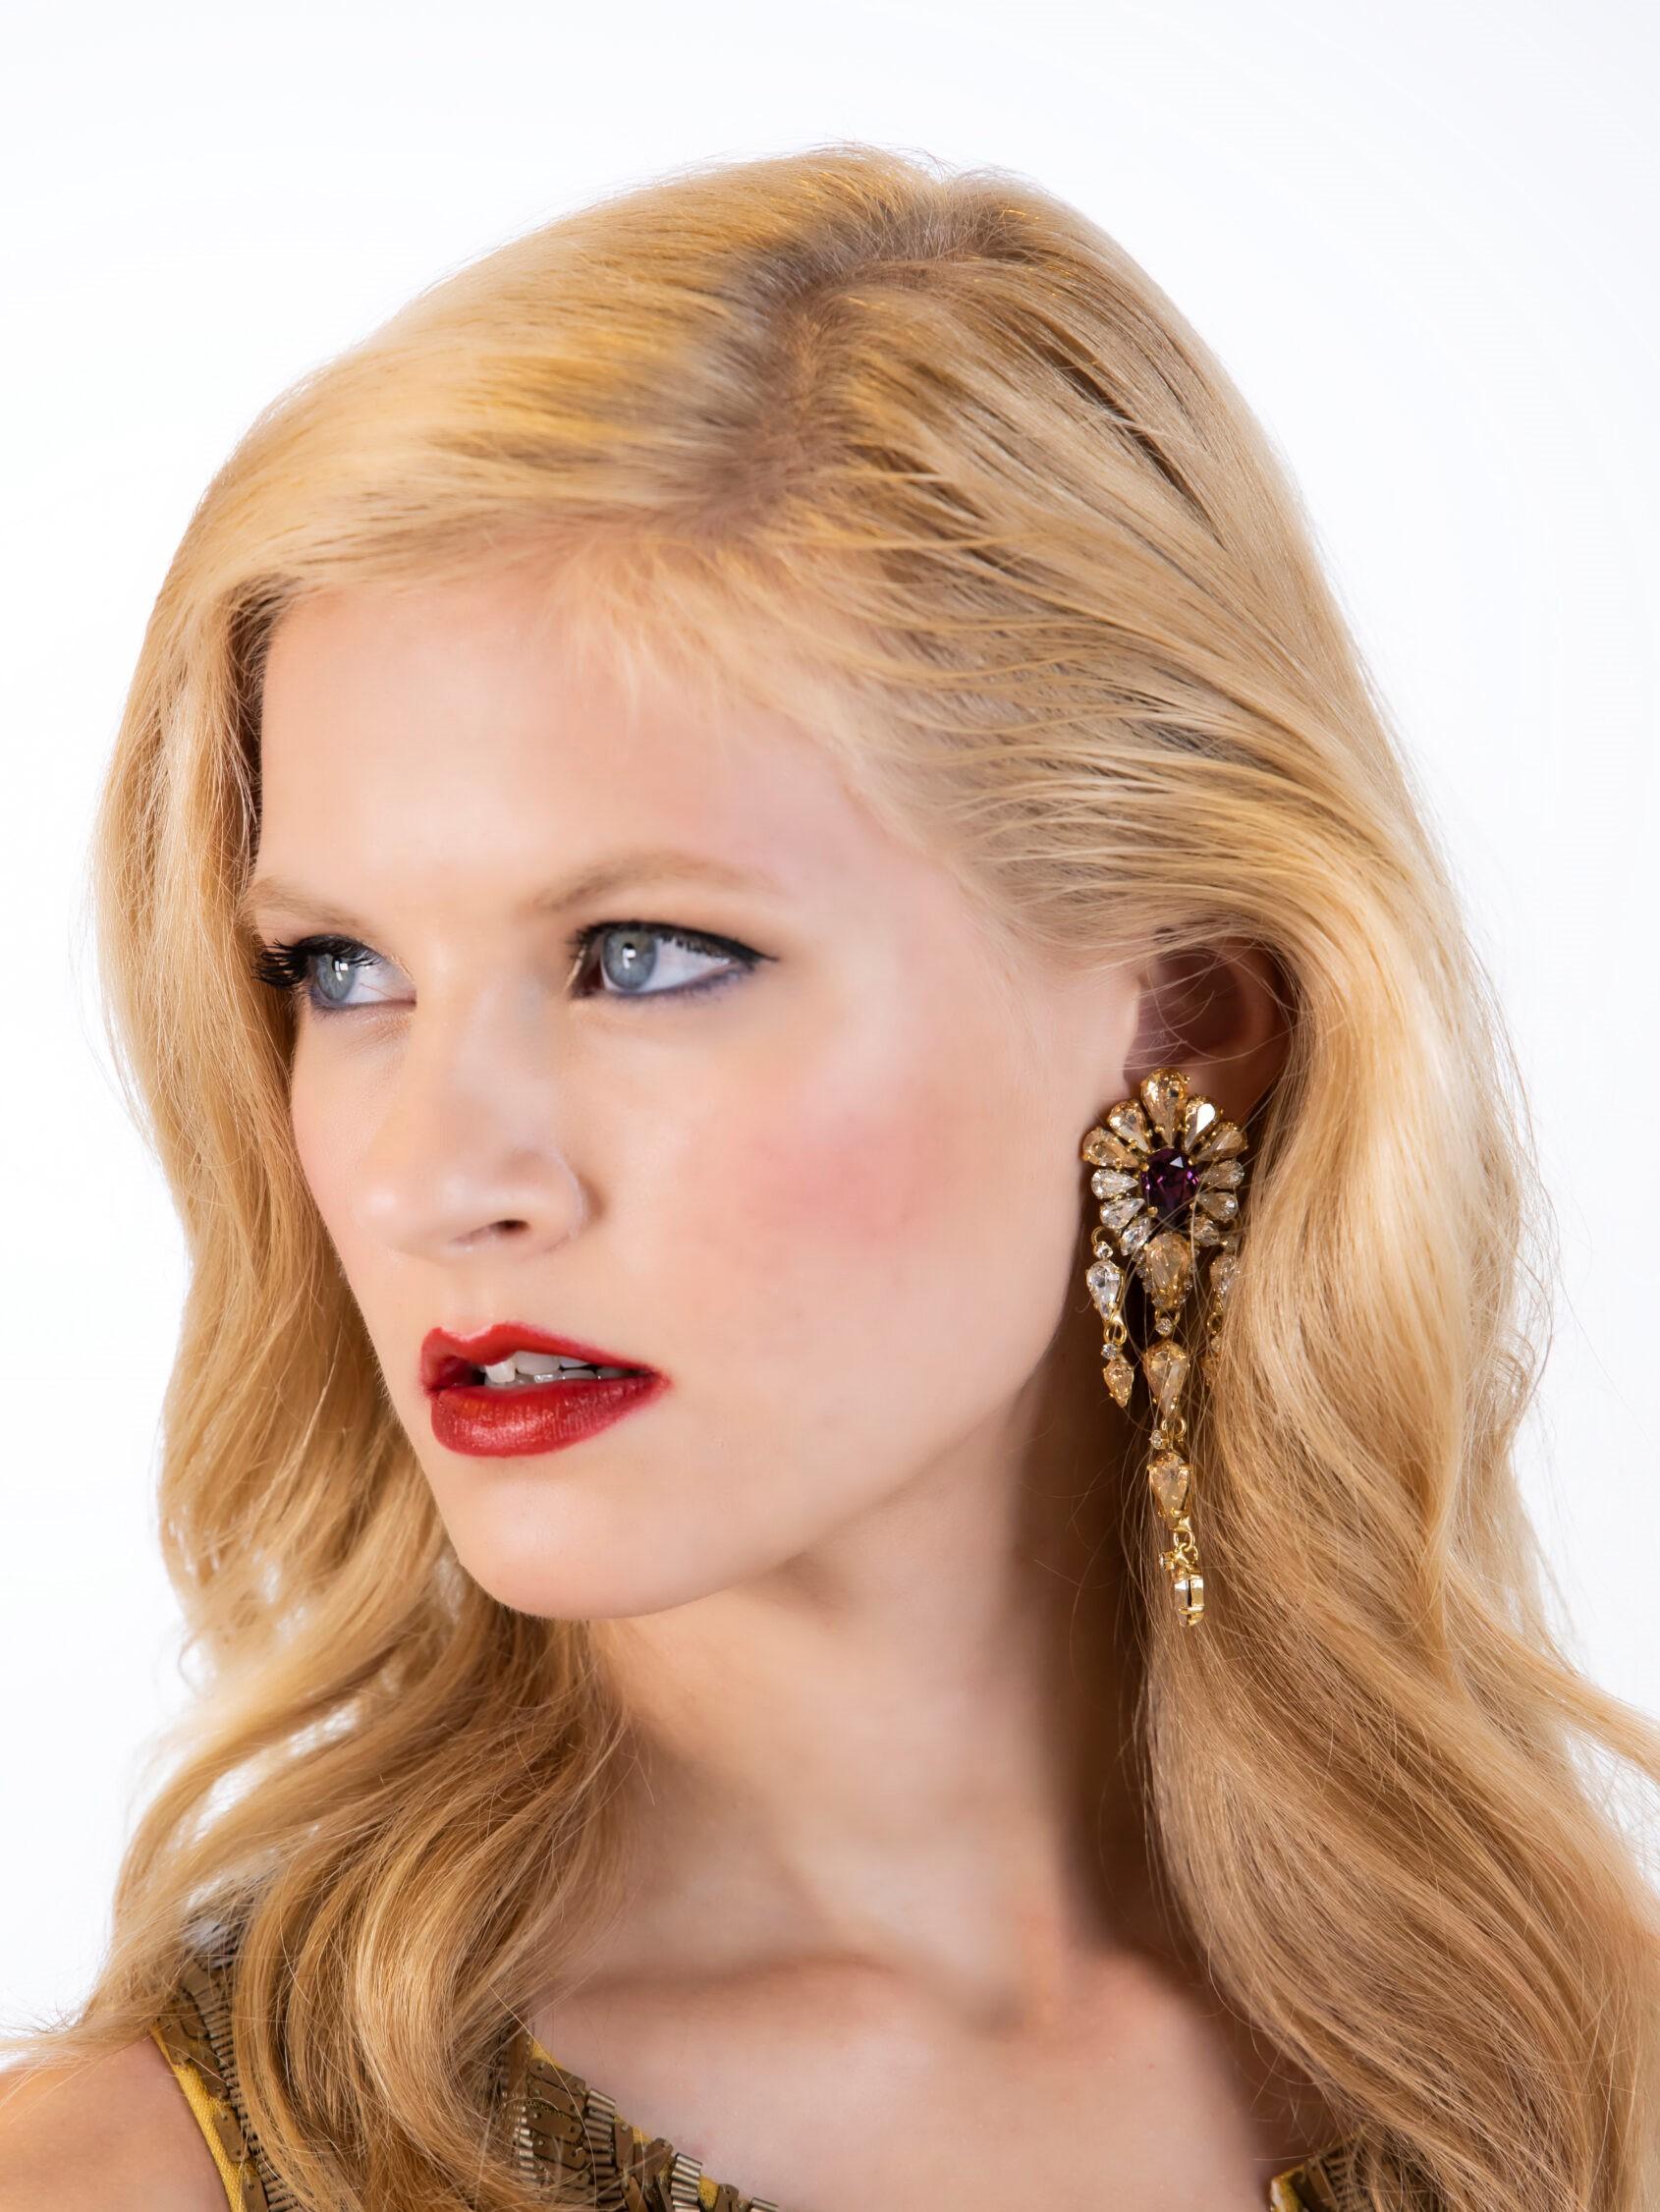 Earring - The Shiloh